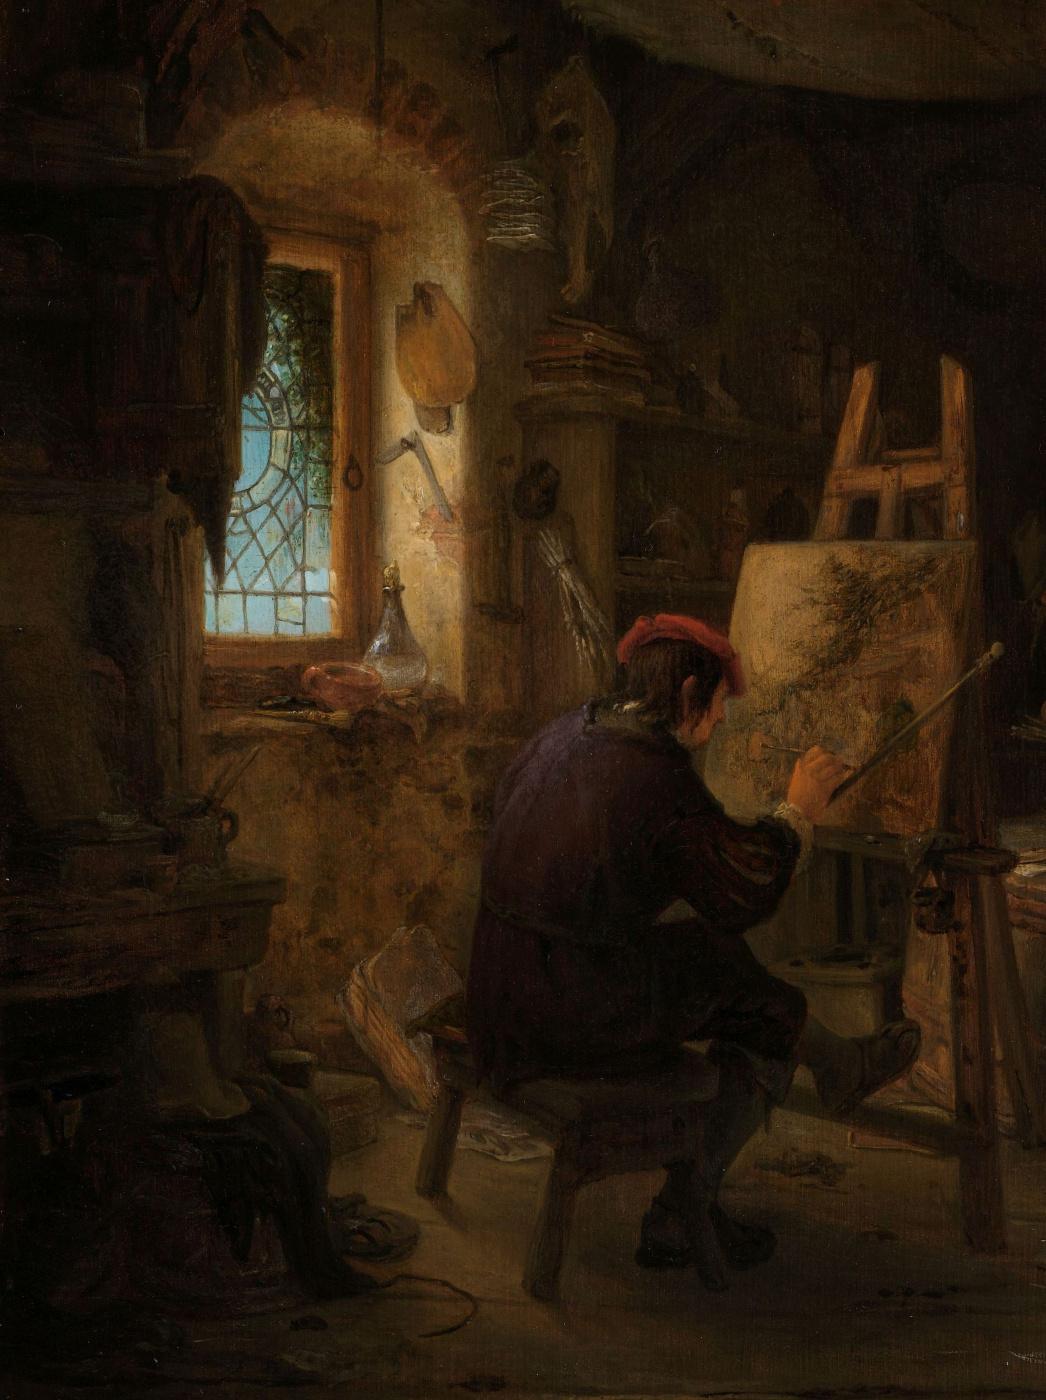 Adrian Jans van Ostade. The artist's Studio. Fragment. The artist in the interior